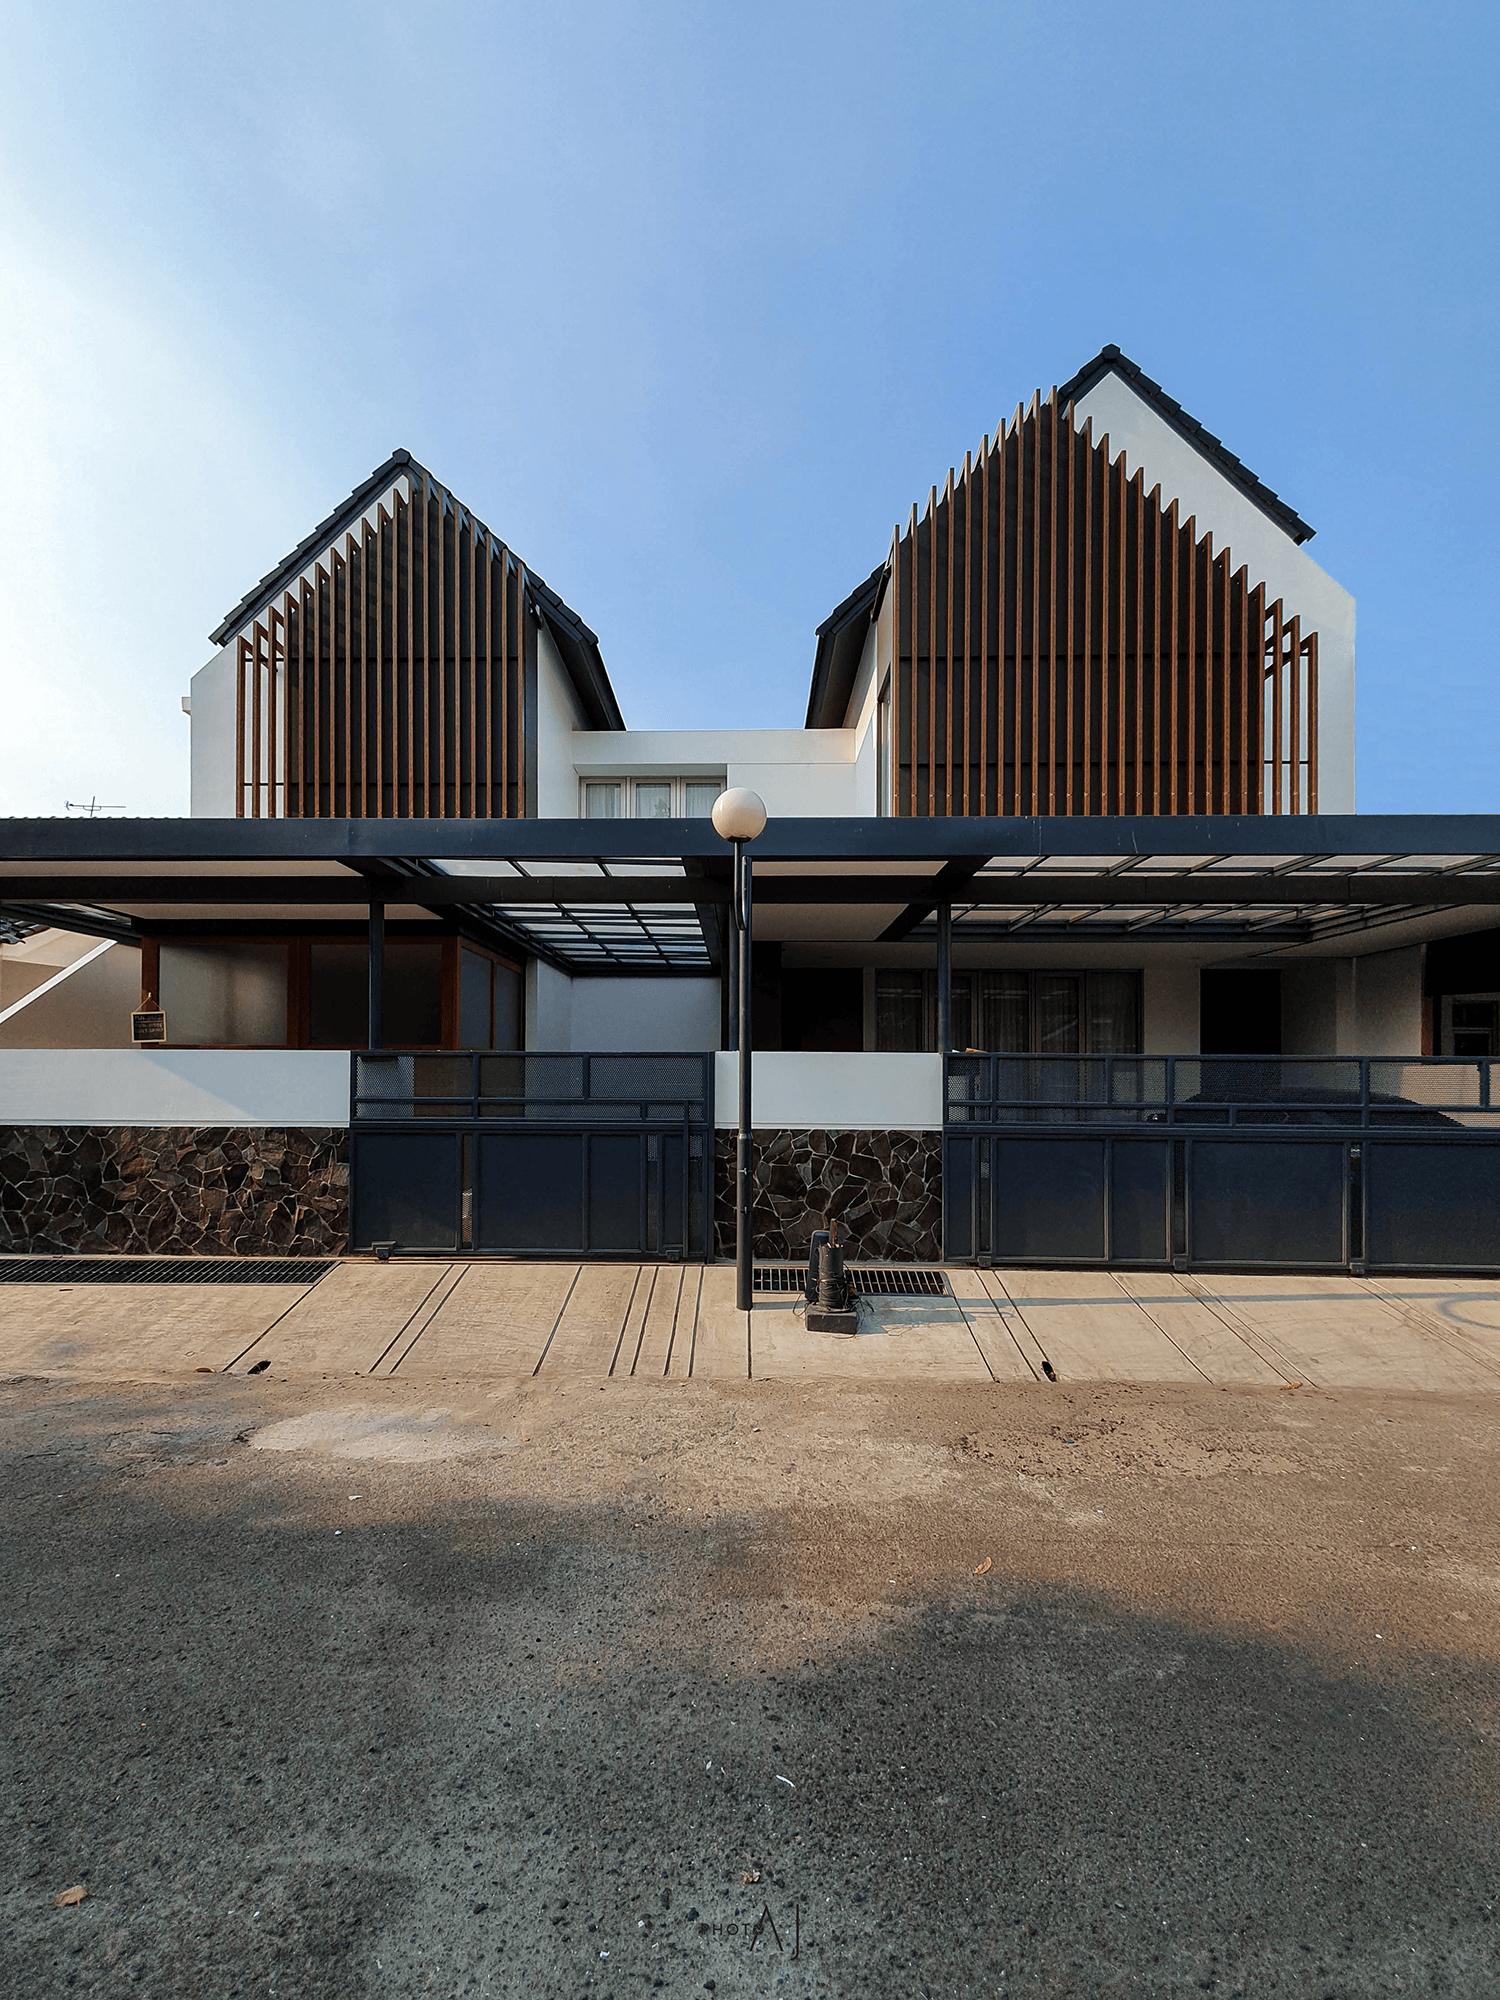 Monokroma Architect Zen House Lippo Karawaci, Binong, Kec. Curug, Tangerang, Banten, Indonesia Lippo Karawaci, Binong, Kec. Curug, Tangerang, Banten, Indonesia Monokroma-Architect-Zen-House Contemporary 88920